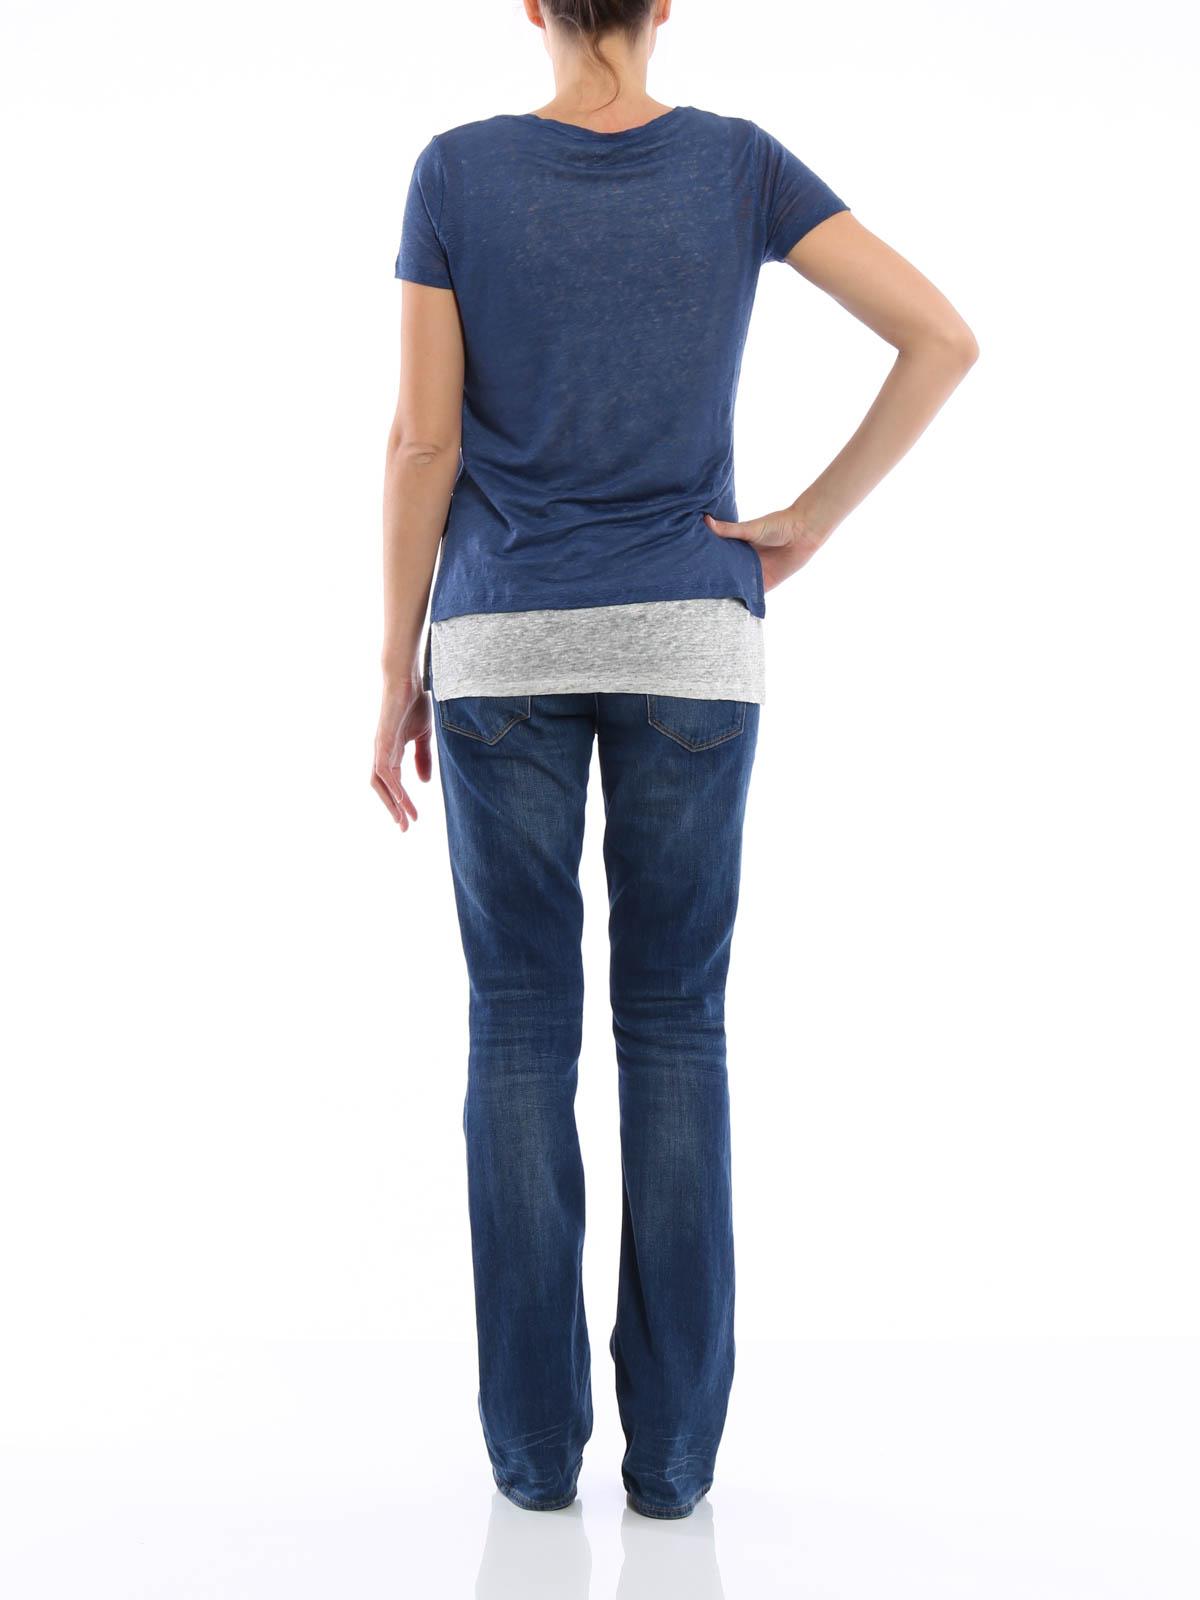 V neck layered t shirt de majestic filatures t shirts for V neck t shirt online shopping